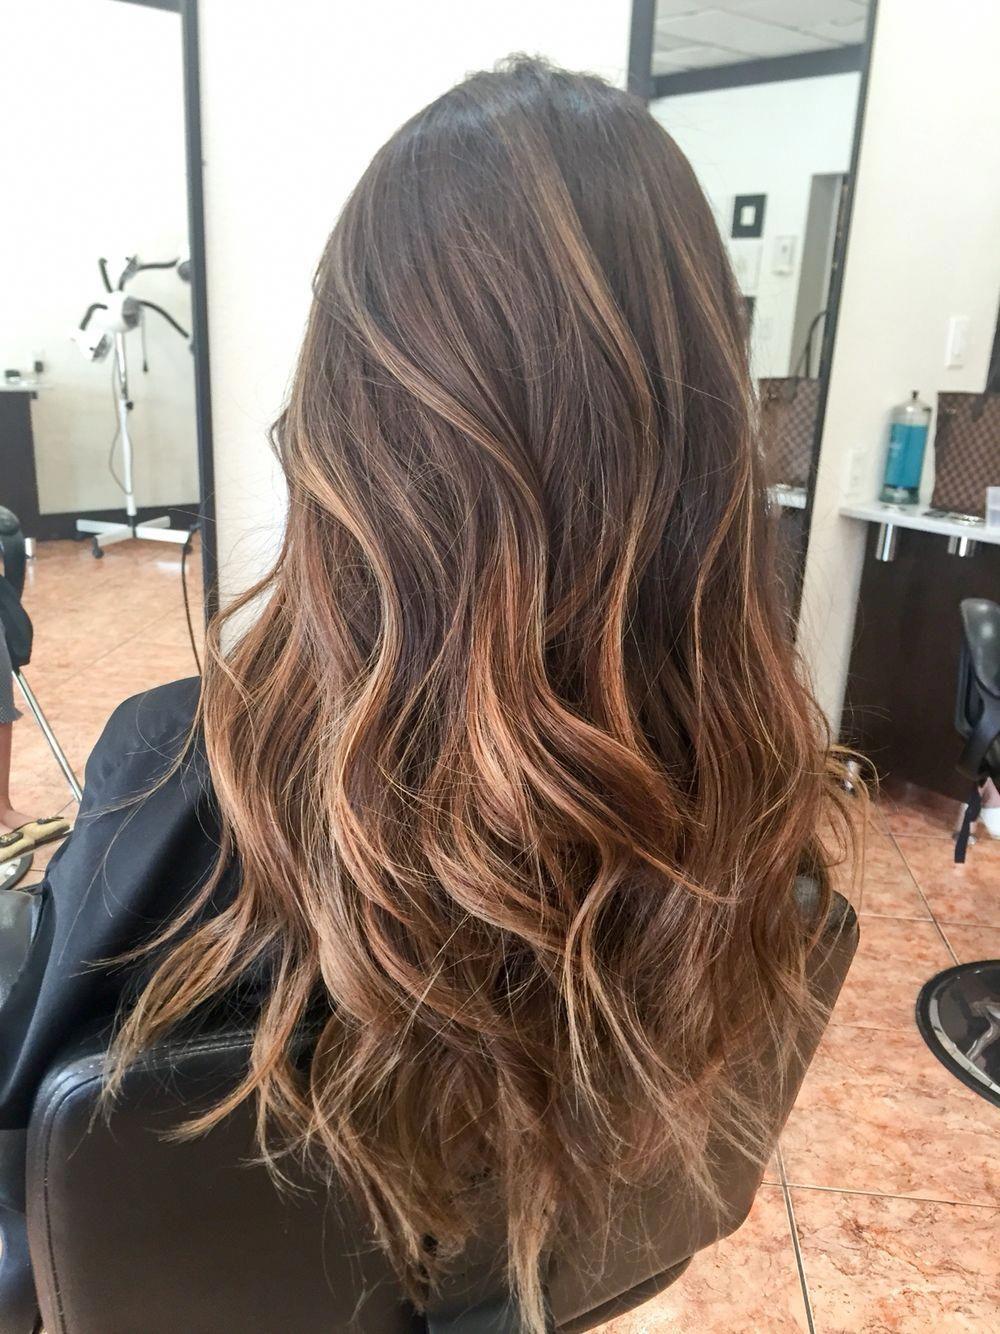 Caramel Balayage Highlights On Dark Hair. Are you looking